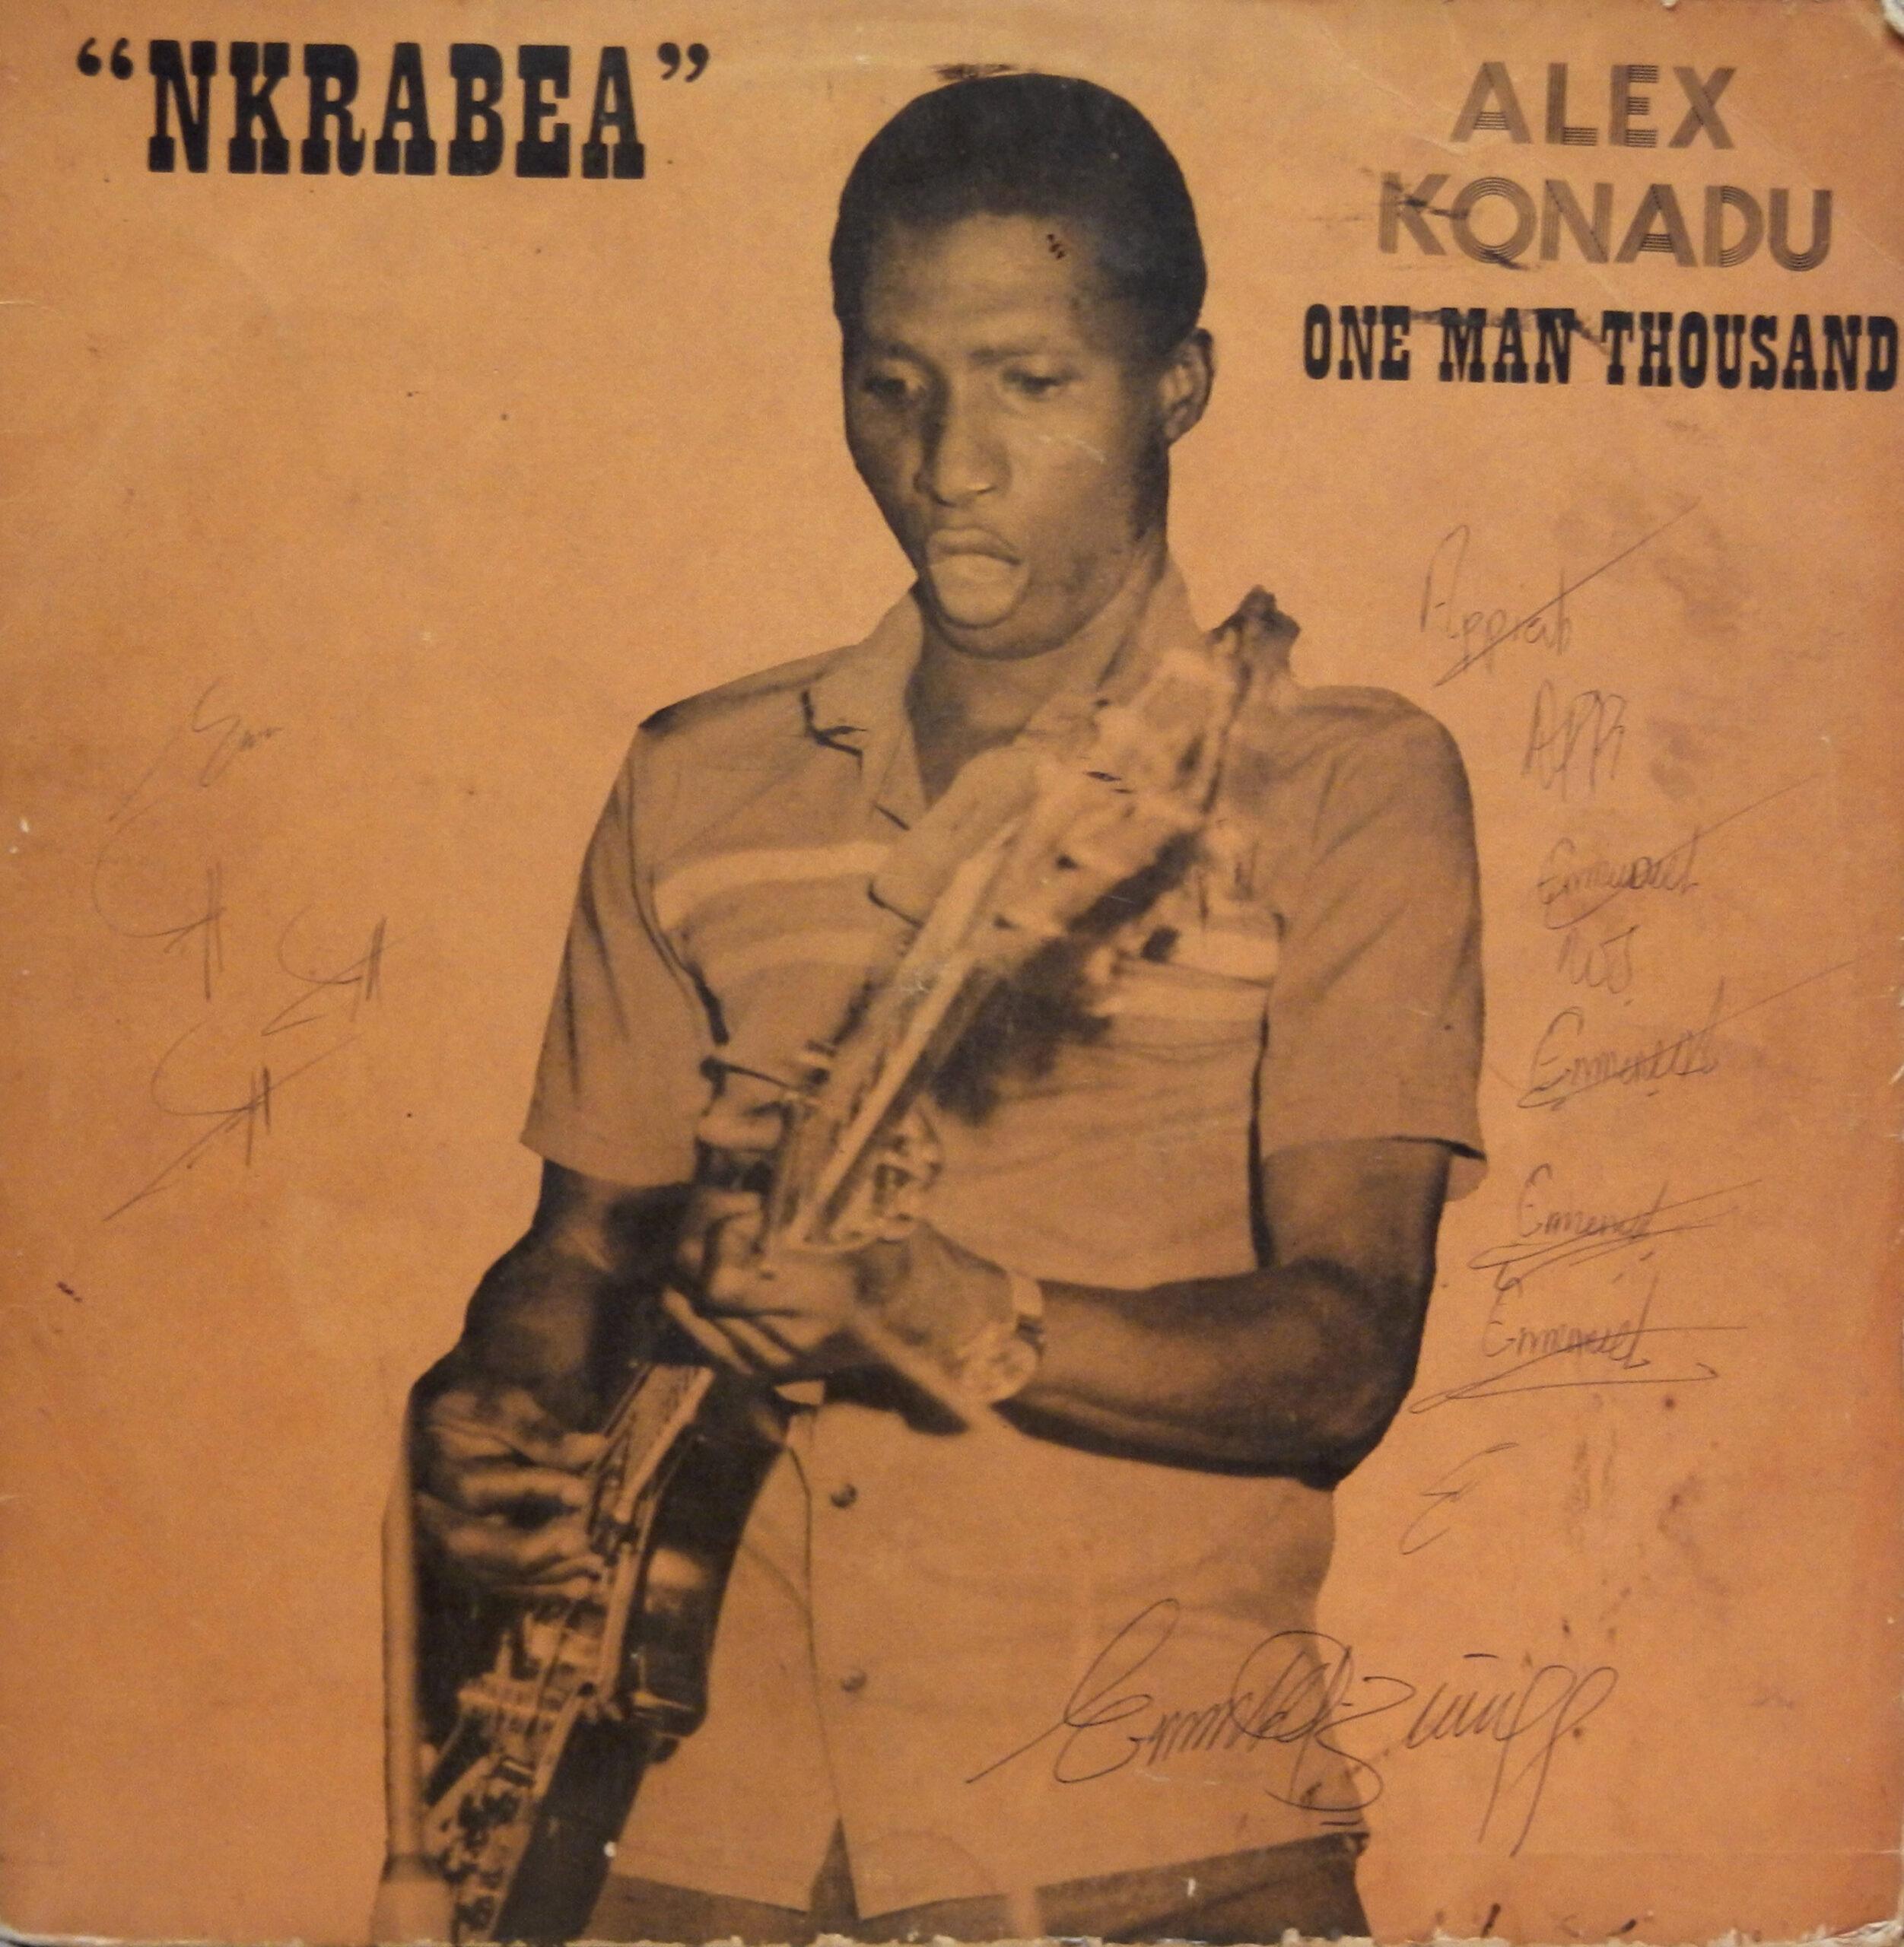 Alex Konadu One Man Thousand – Nkrabea 70s GHANA Highlife Afrobeat Music ALBUM